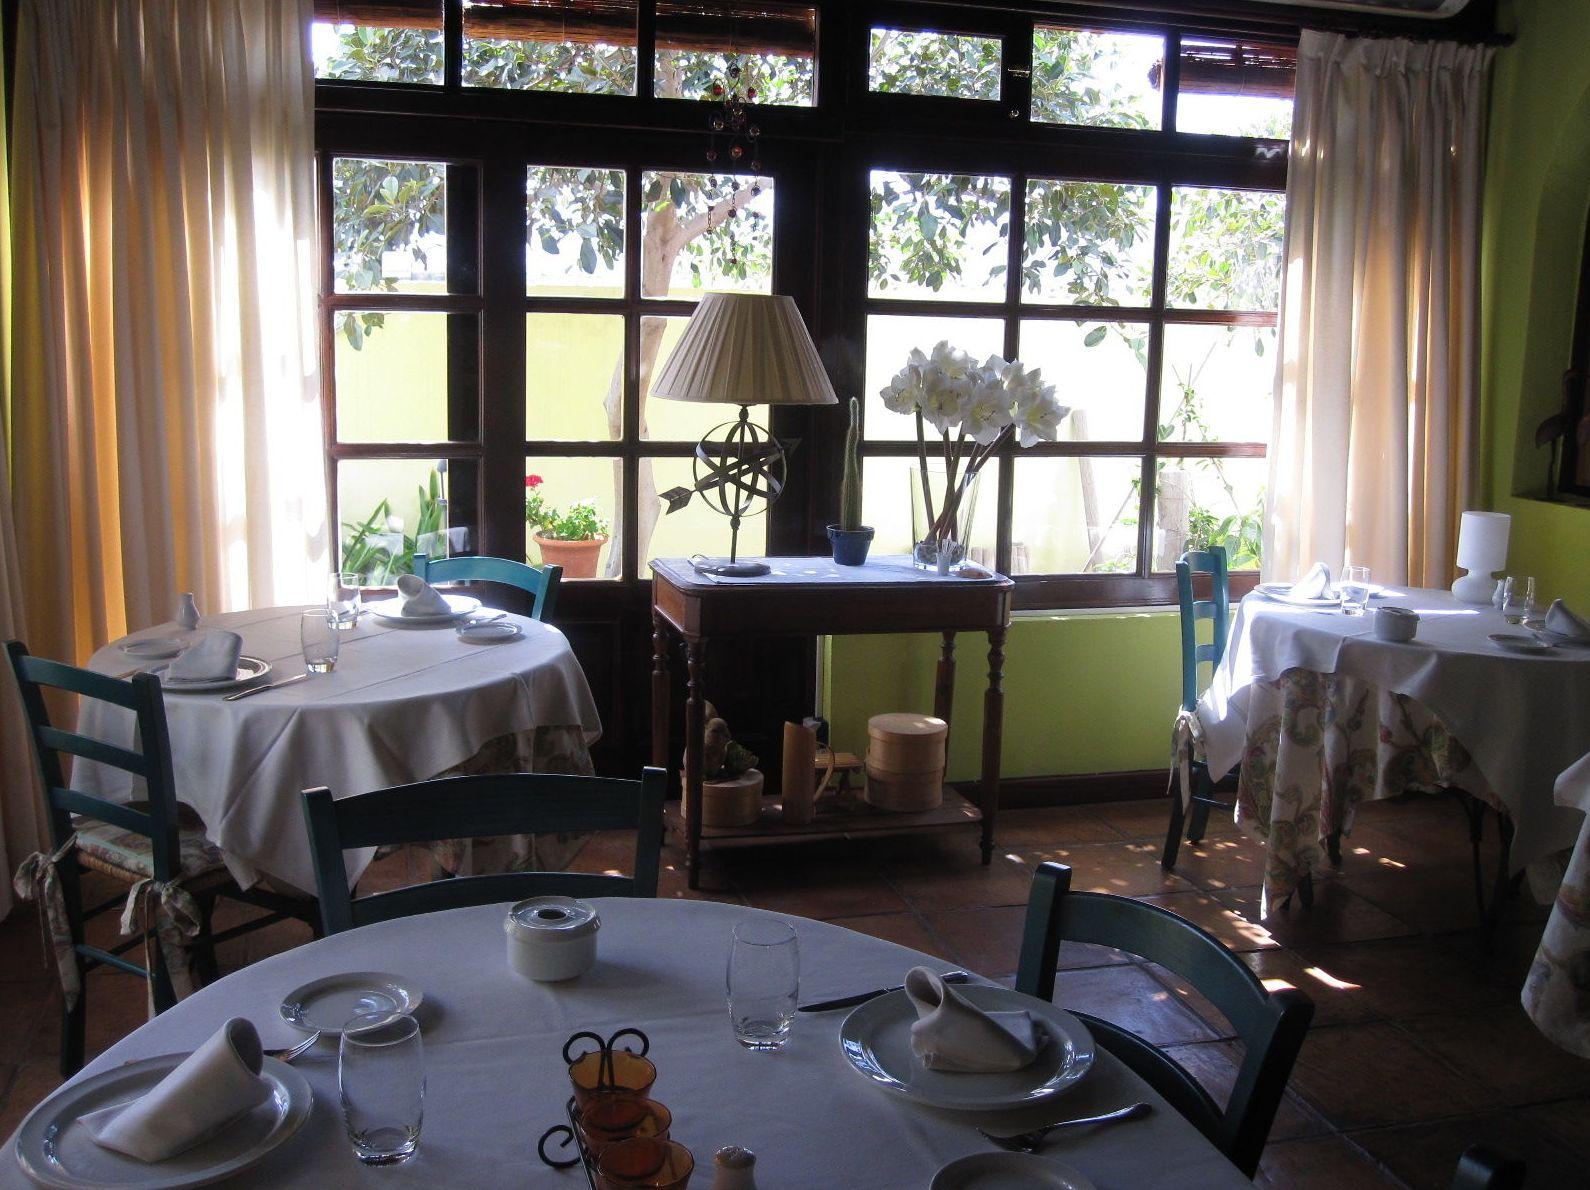 Restaurante tranquilo